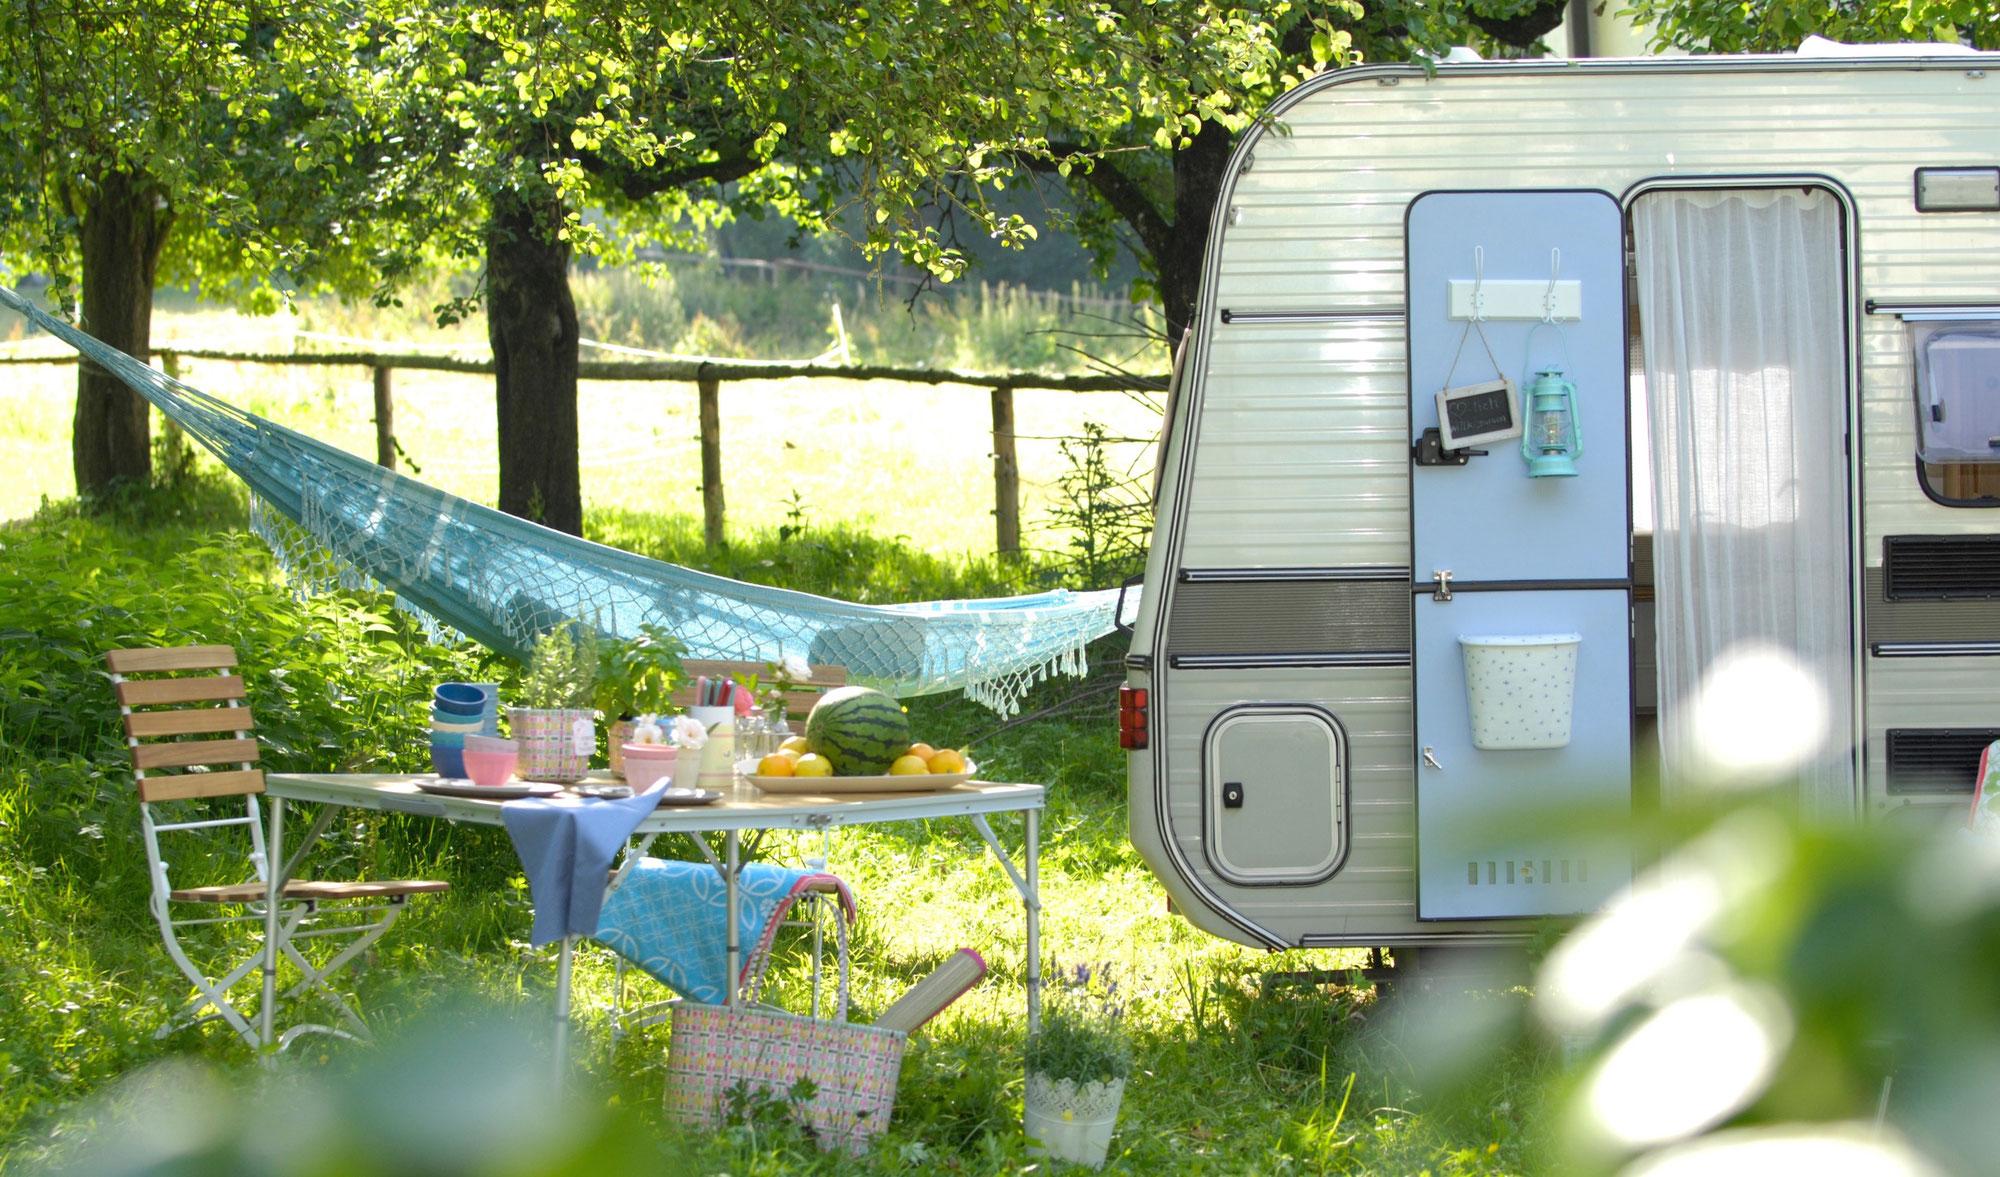 geschirr zur aufbewahrung living at caravan. Black Bedroom Furniture Sets. Home Design Ideas